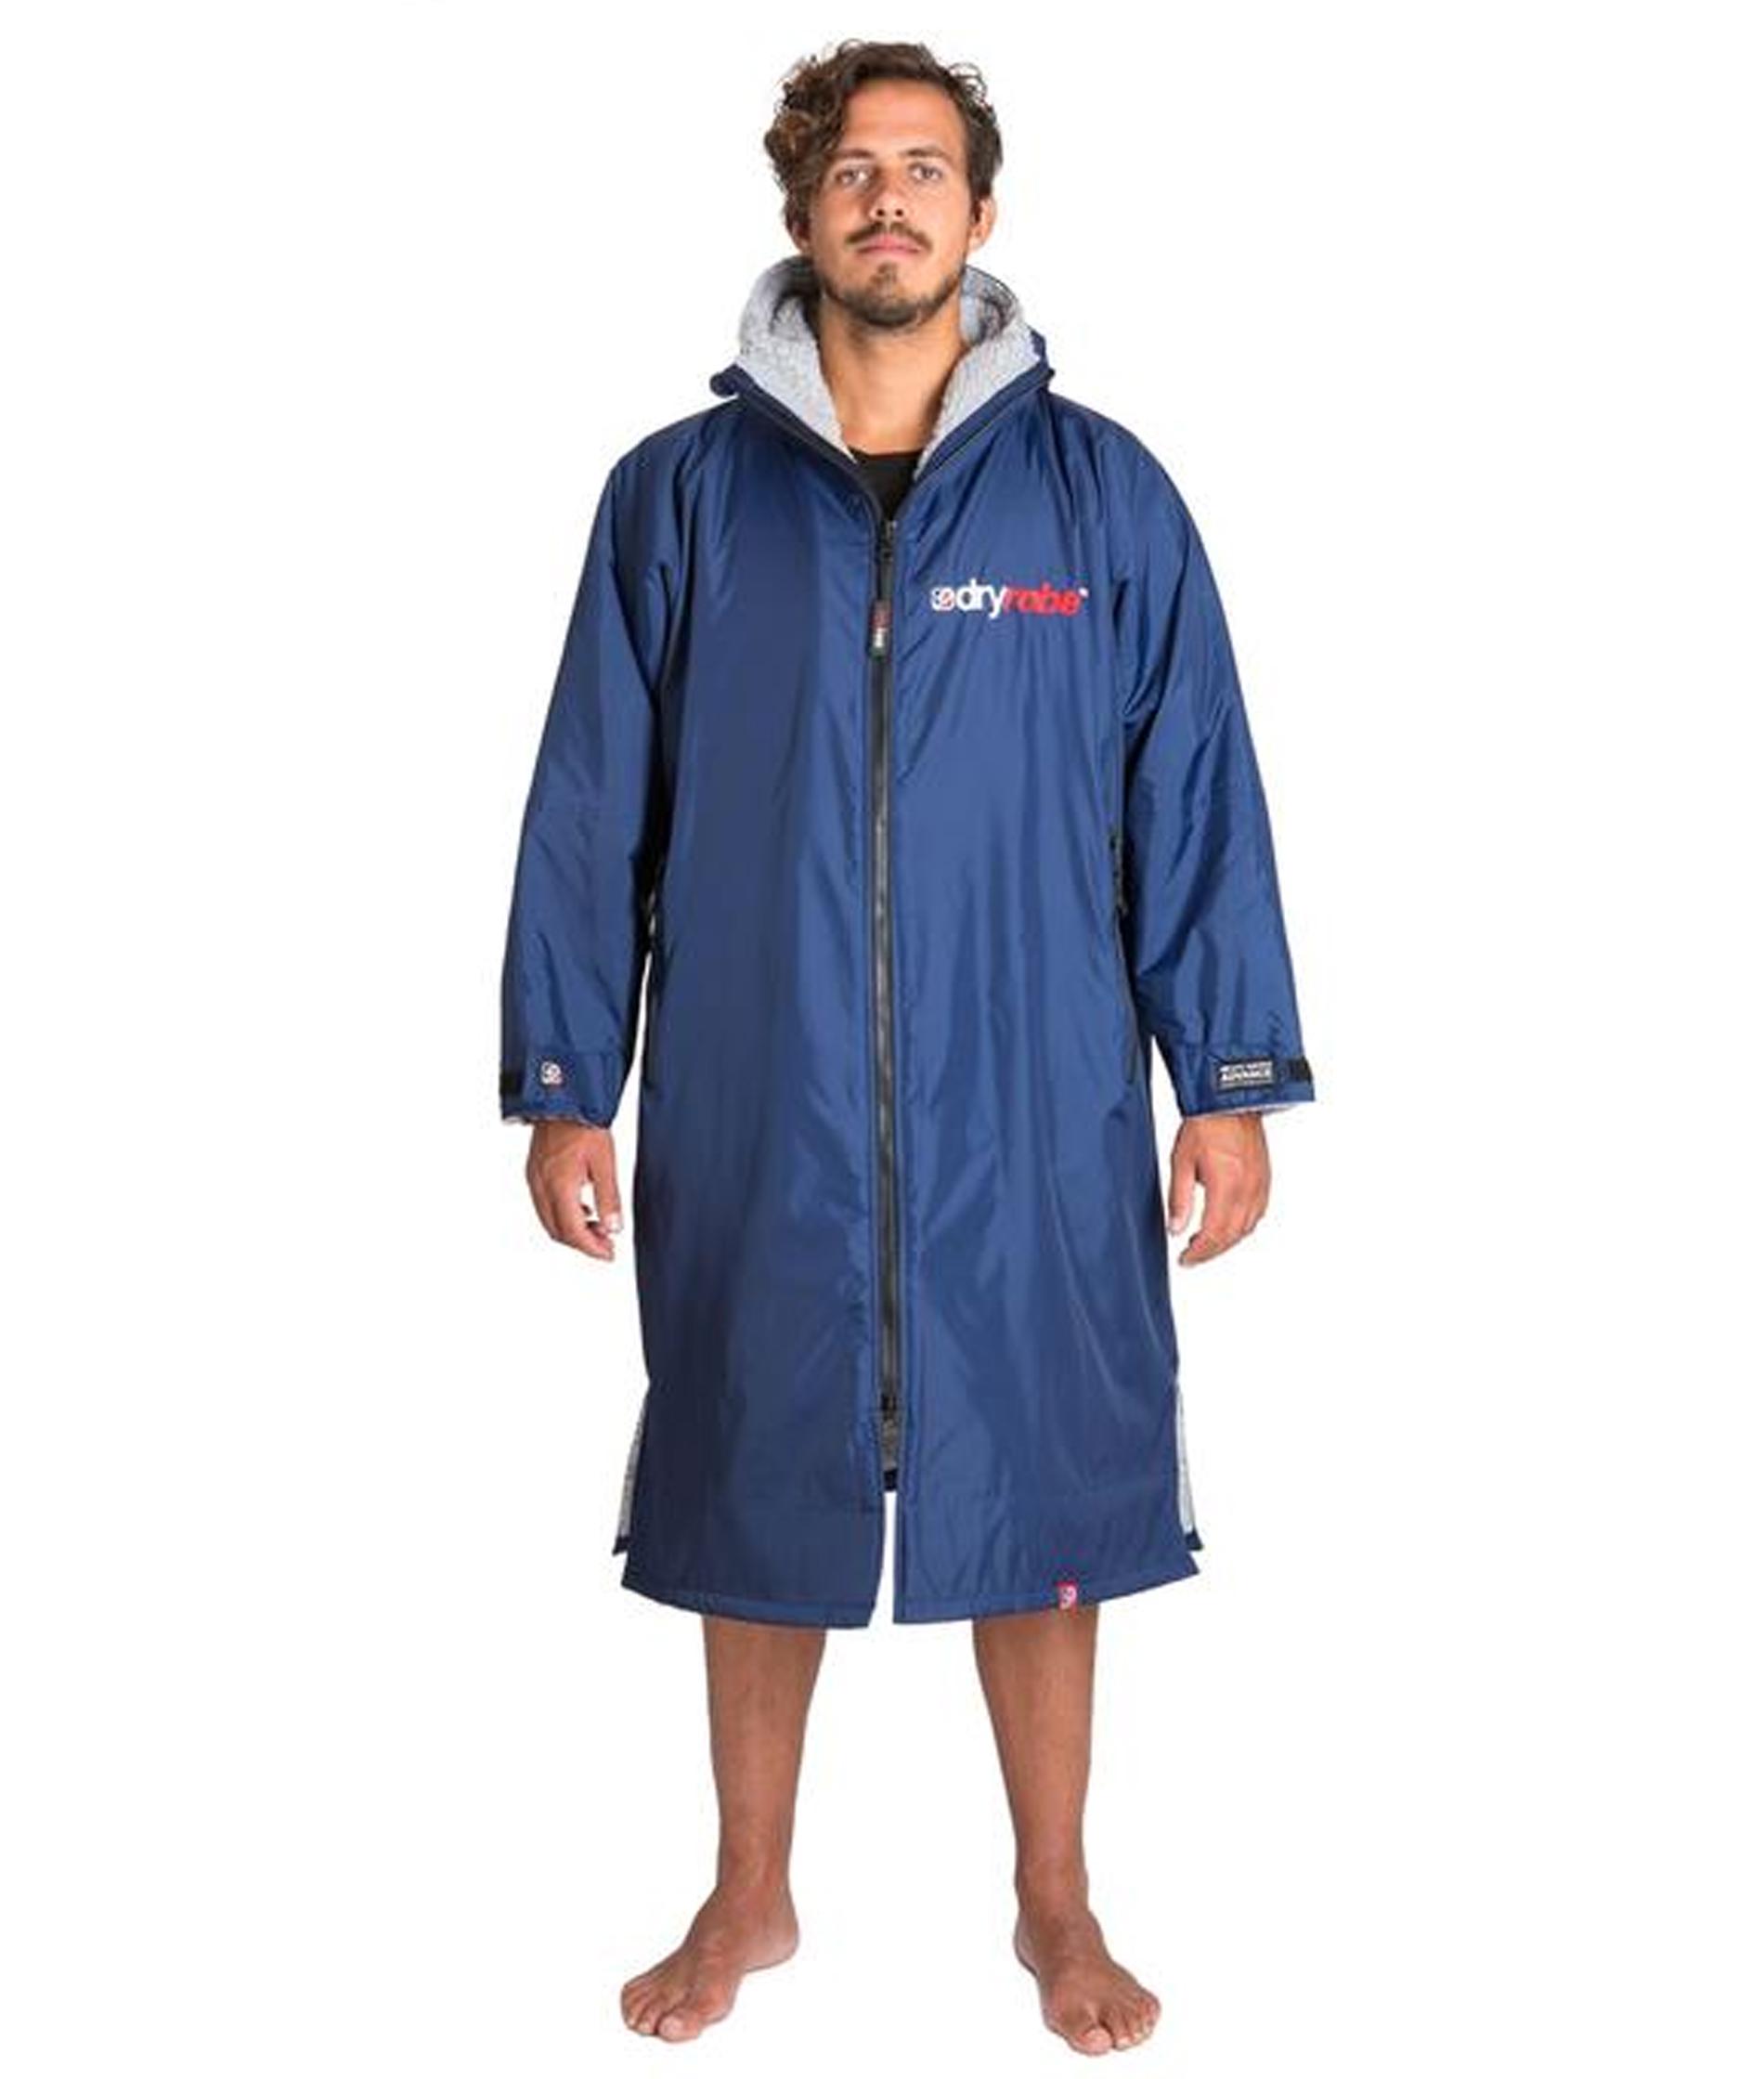 Dryrobe Advance Long Sleeve Navy Blue/Grey - Large